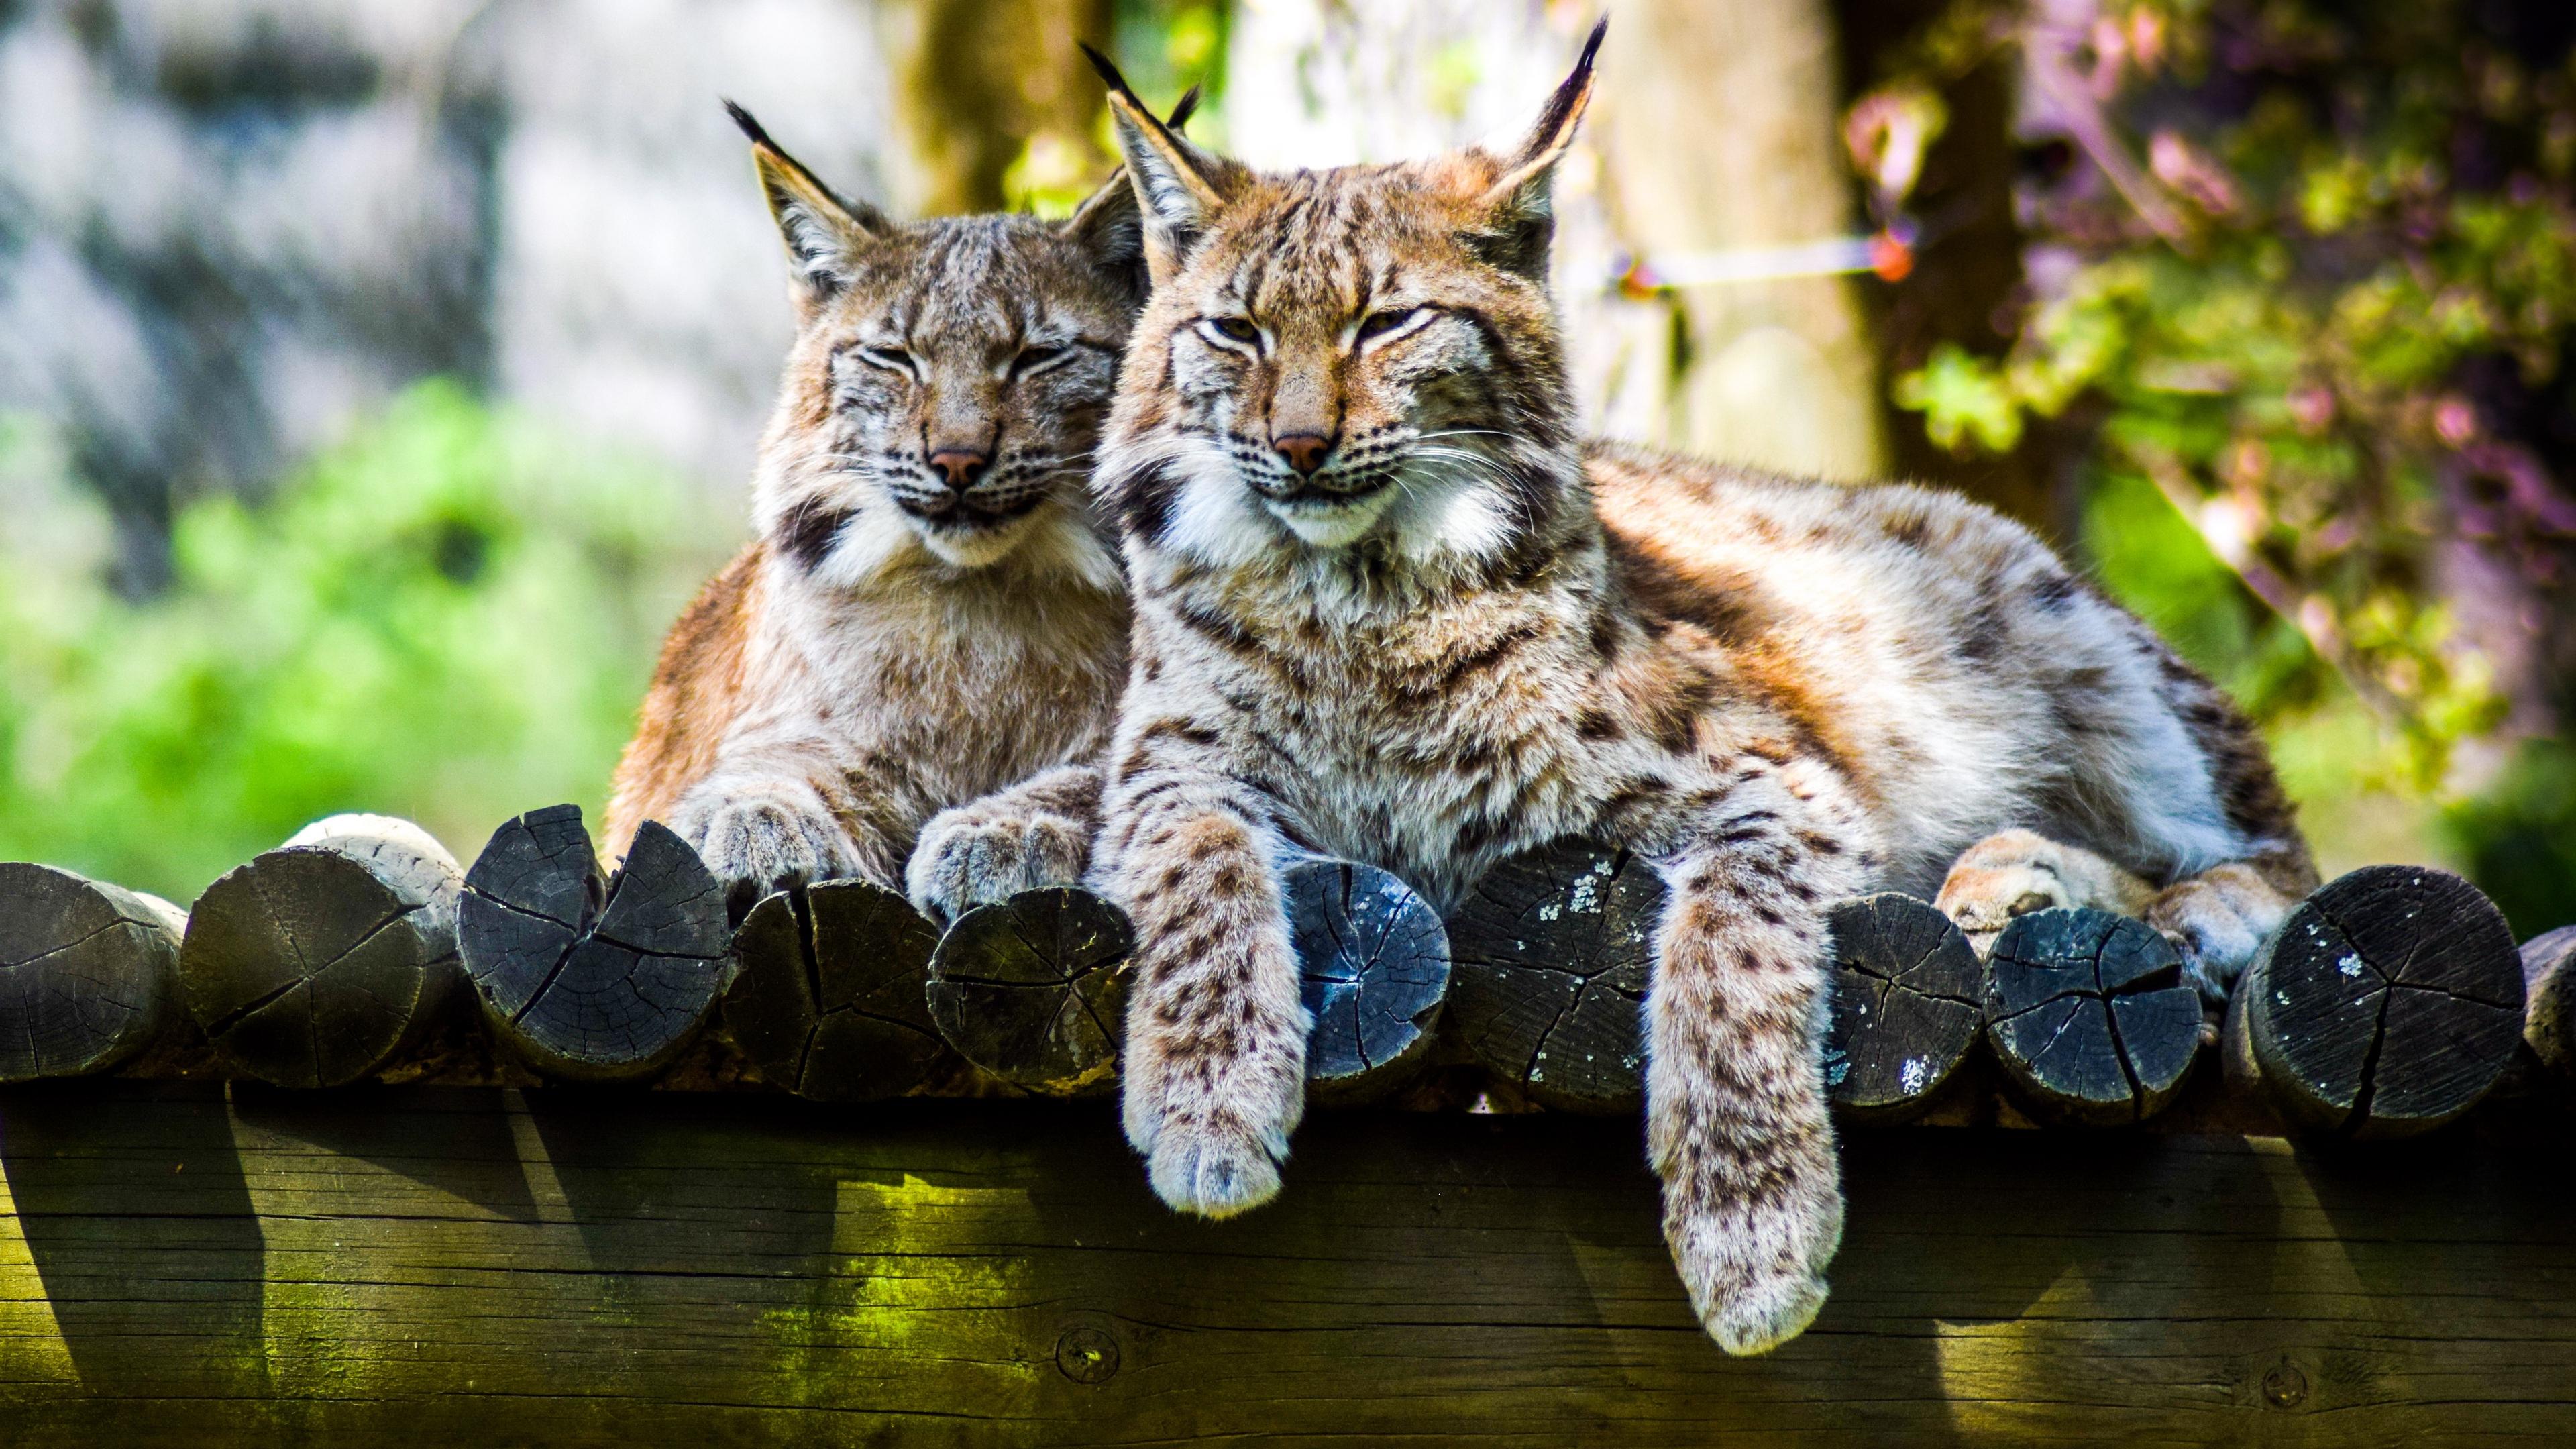 lynx predator large cat 4k 1542242775 - lynx, predator, large cat 4k - Predator, Lynx, large cat